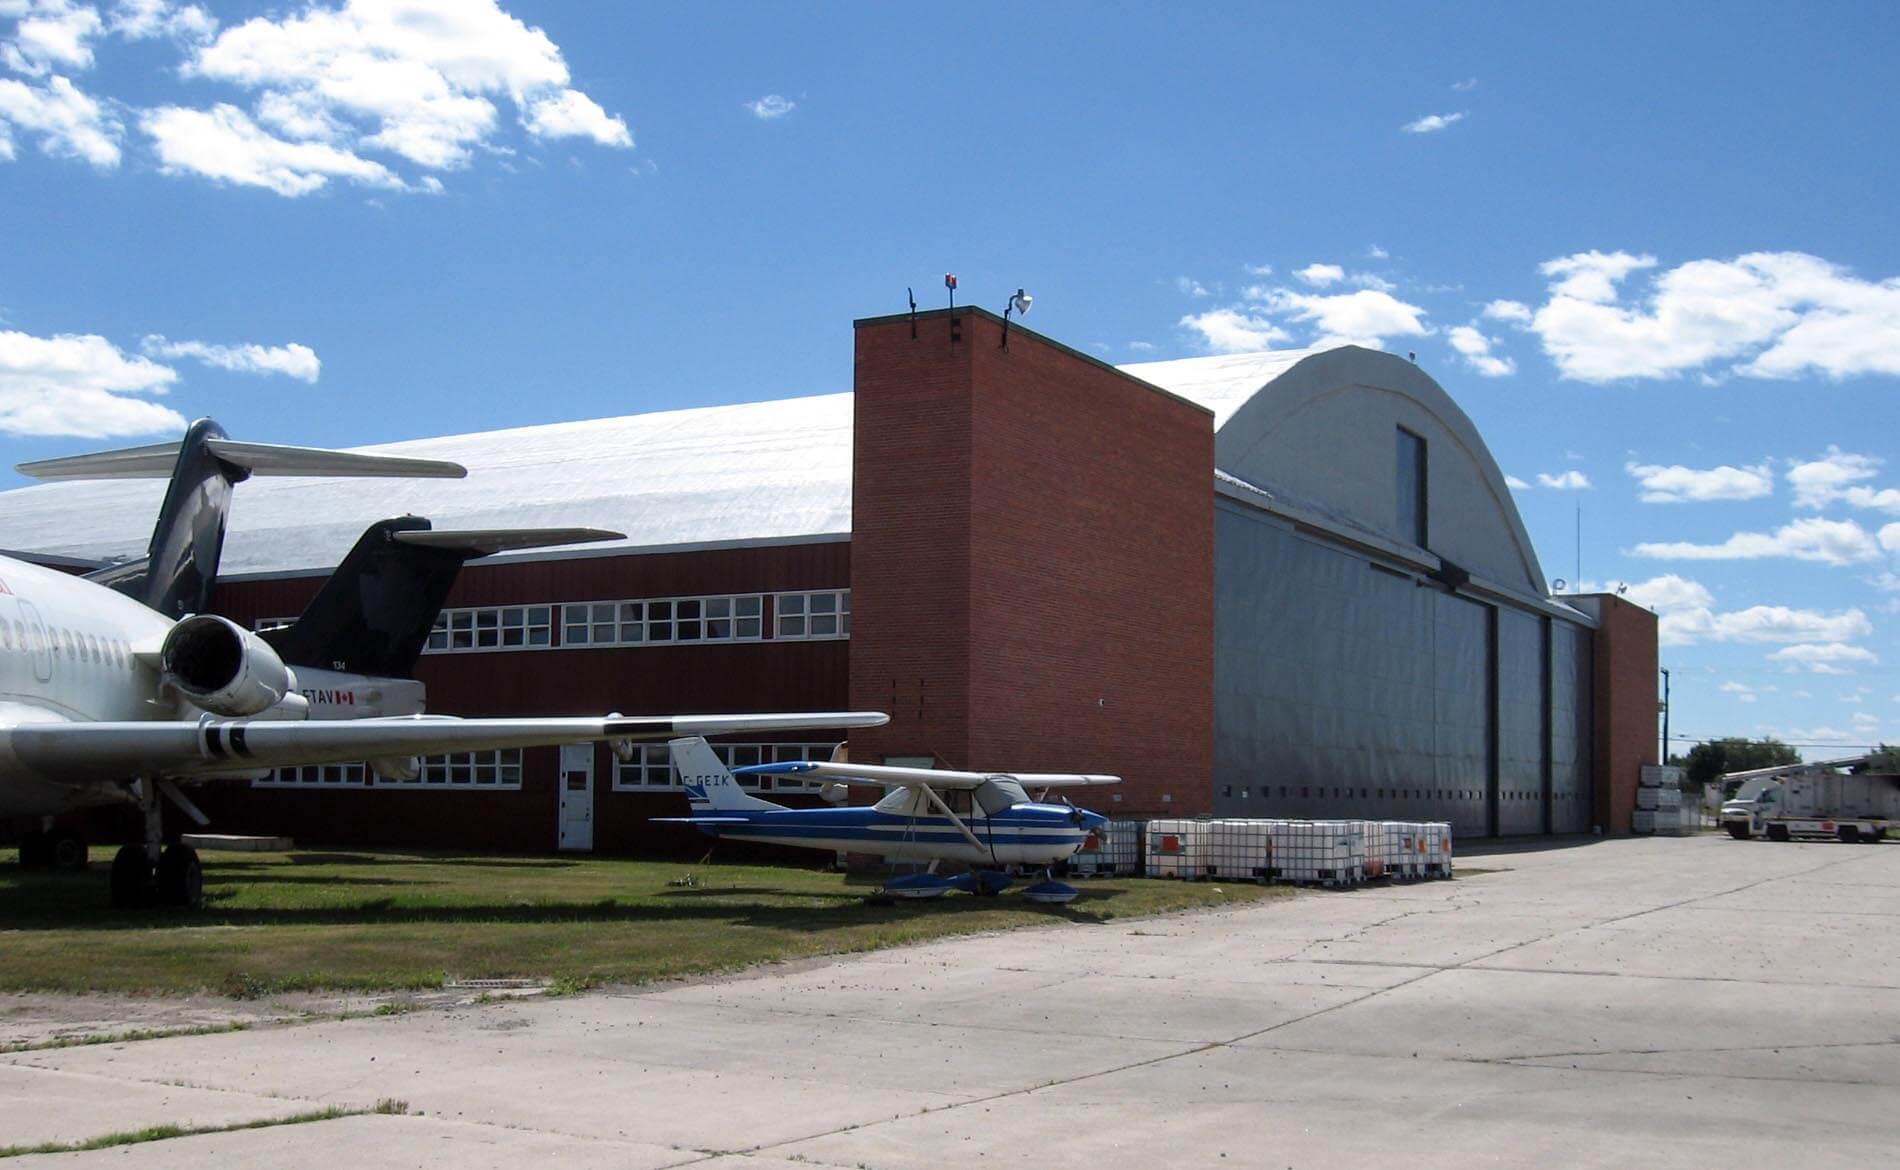 aerologisticsamericainc (1).jpg